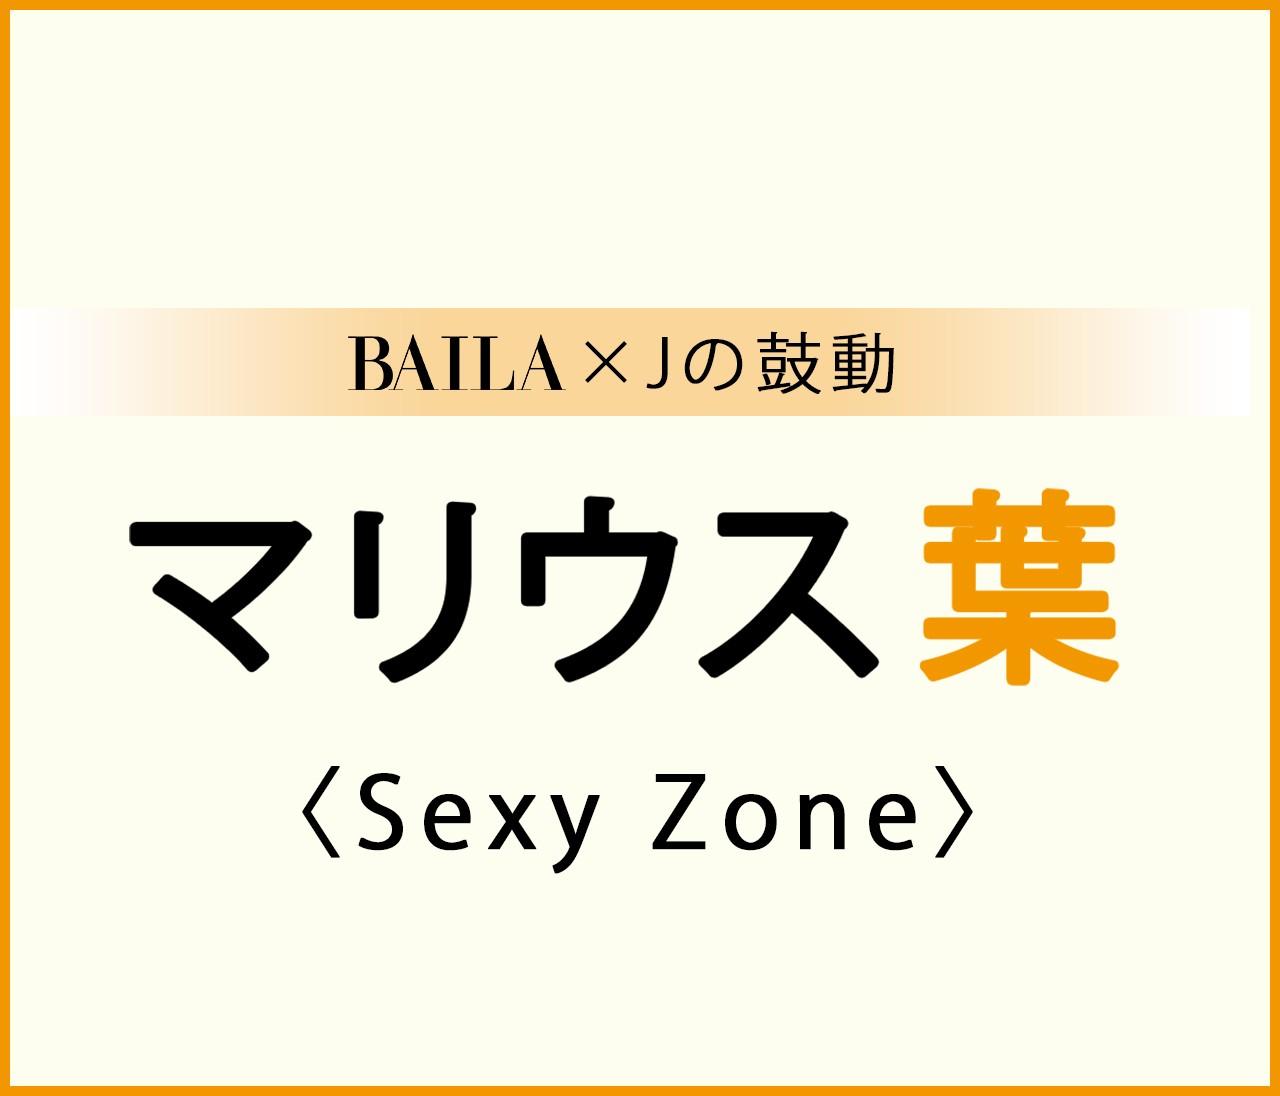 【Sexy Zone】マリウス葉スペシャルインタビュー!【BAILA × Jの鼓動】